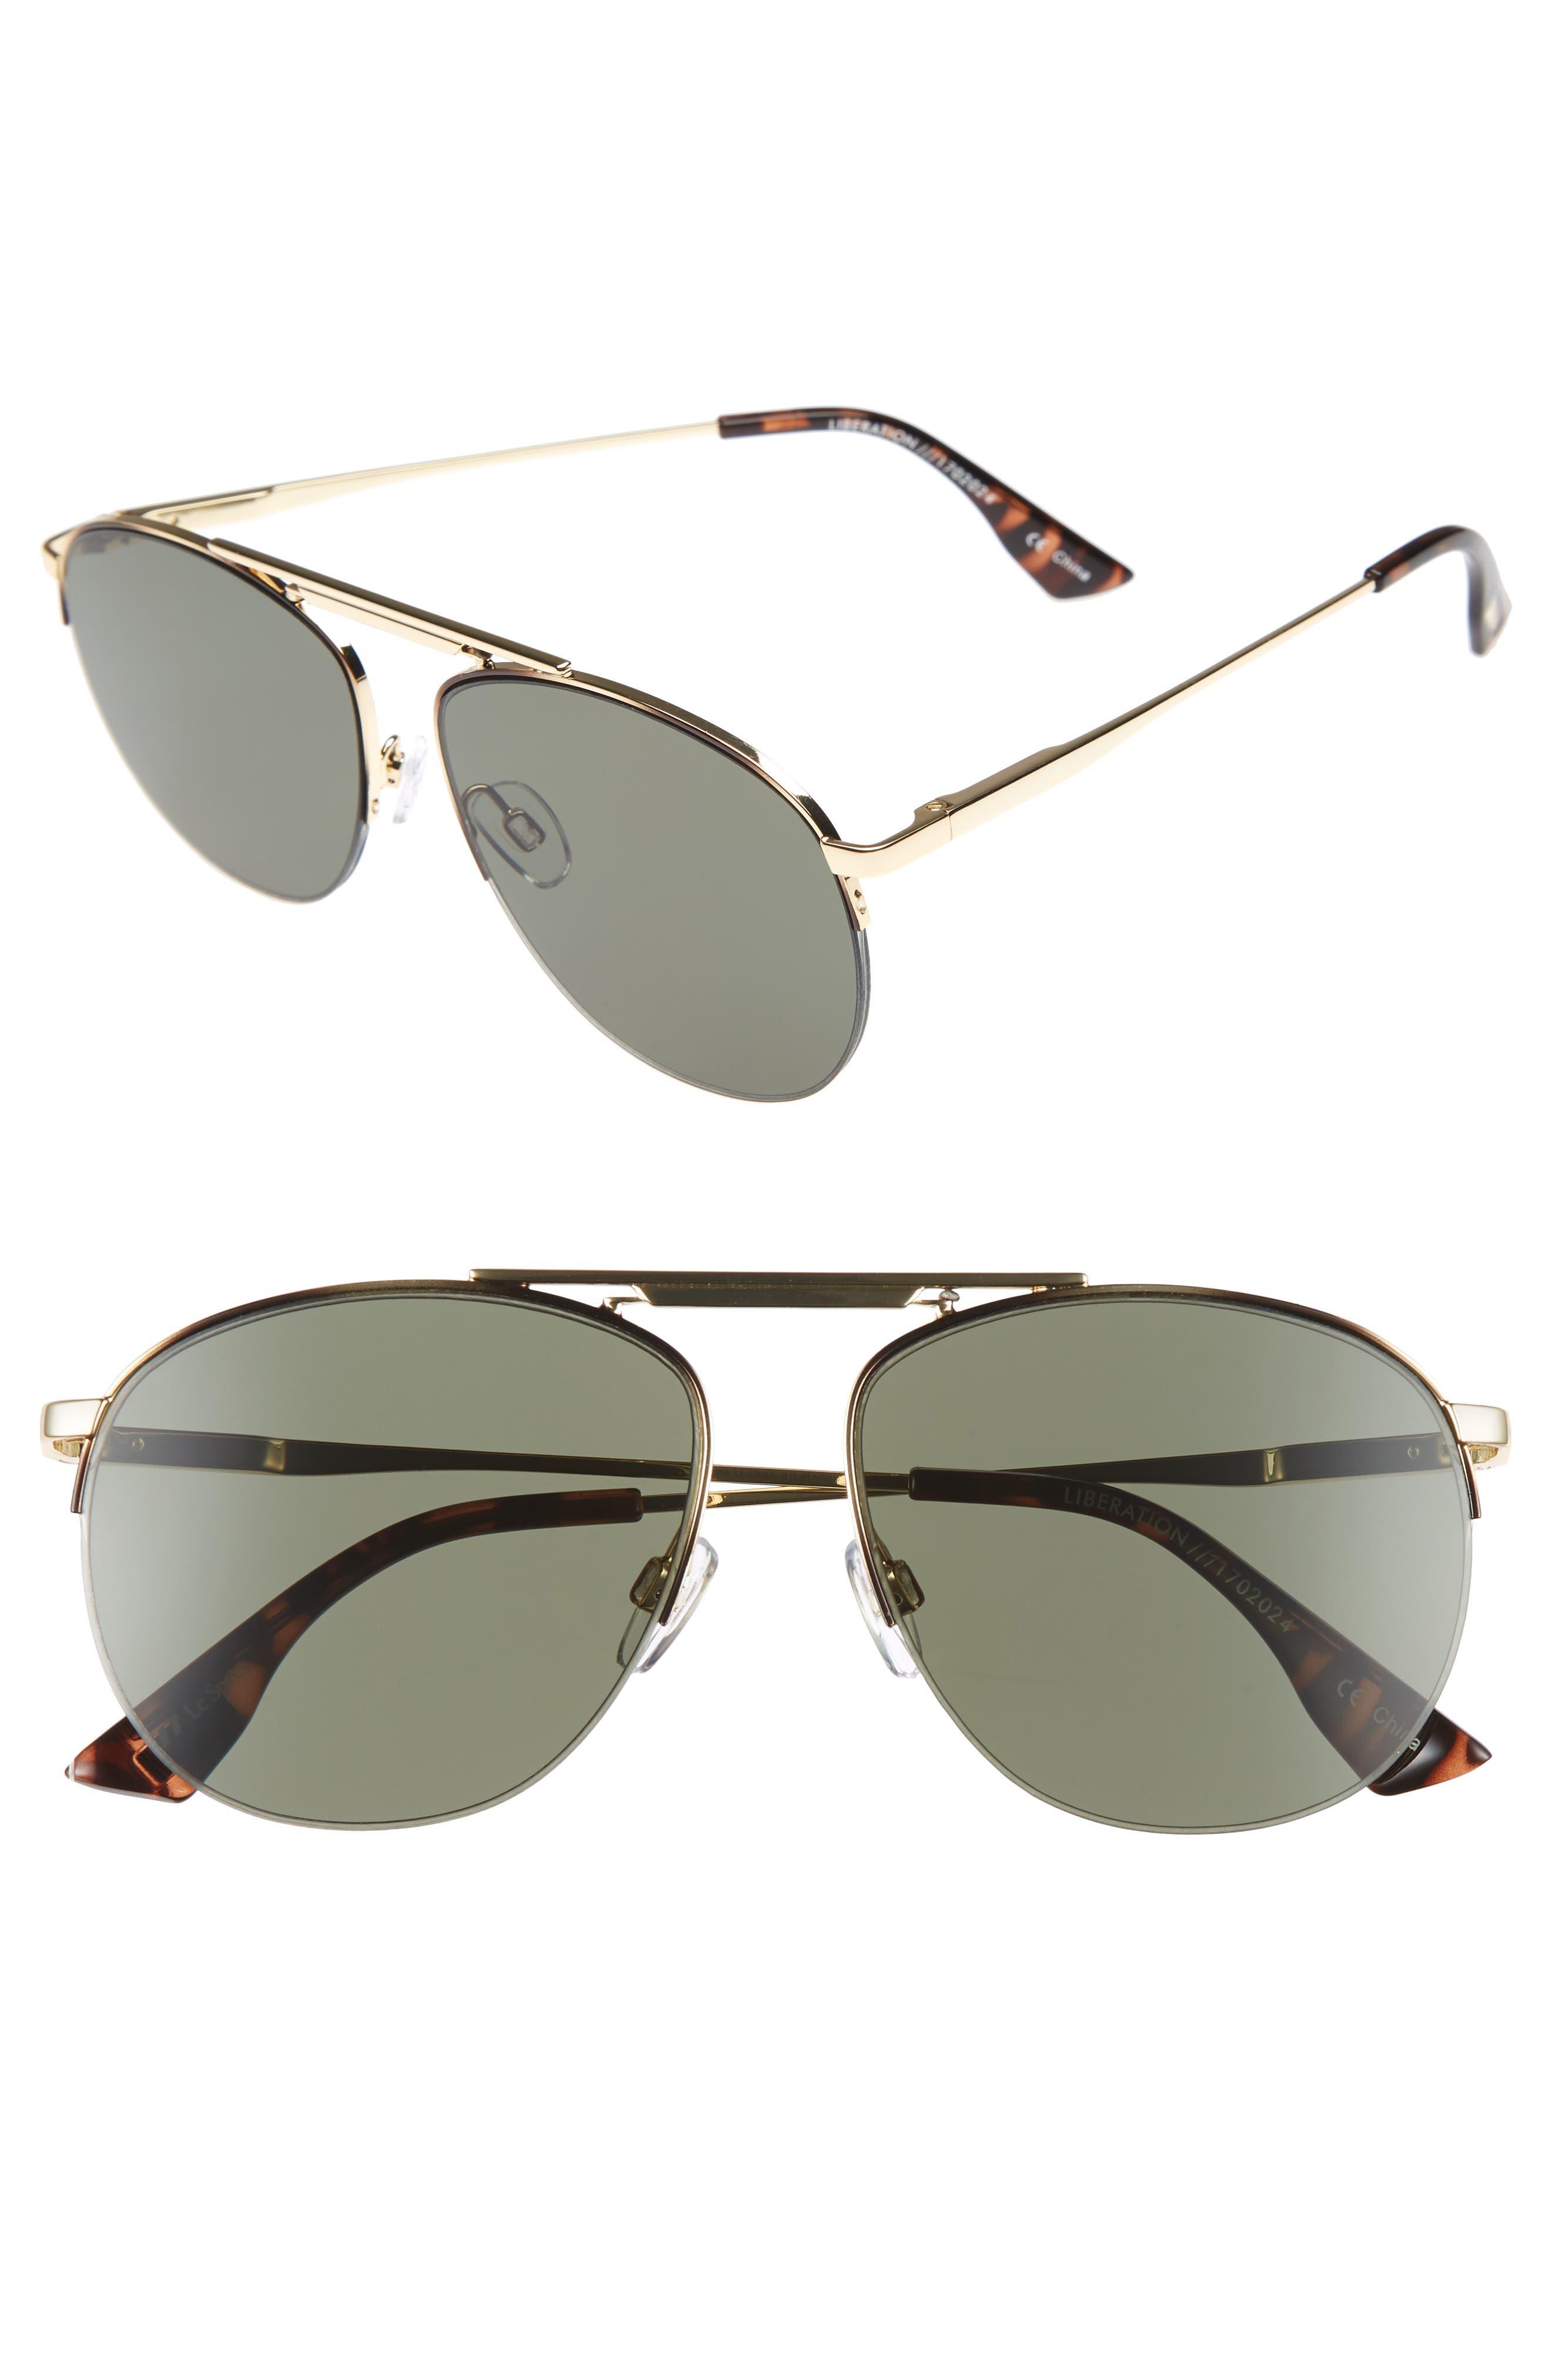 Main Image - Le Specs Liberation 57mm Aviator Sunglasses